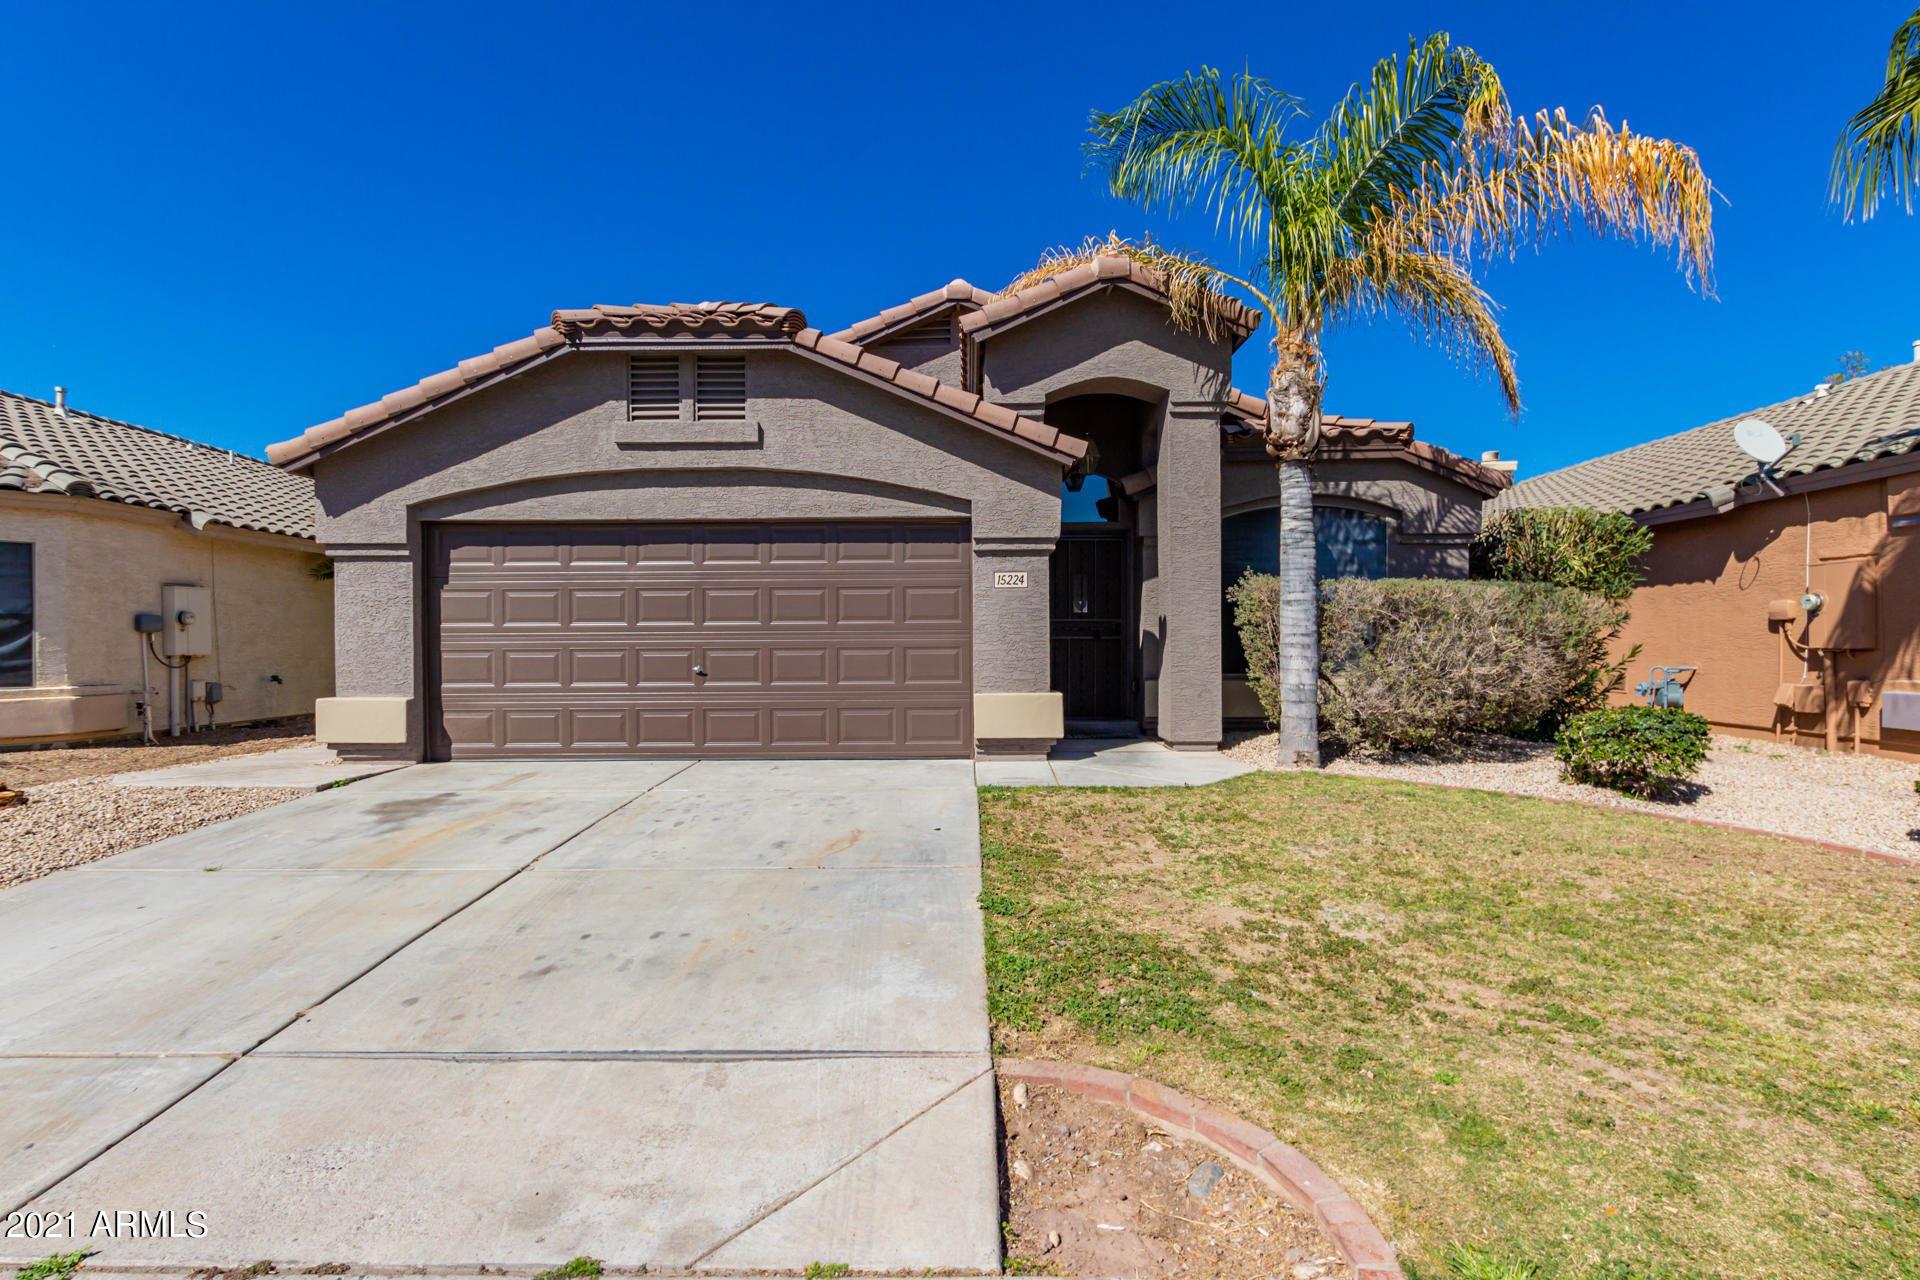 Photo of 15224 W MELISSA Lane, Surprise, AZ 85374 (MLS # 6200261)